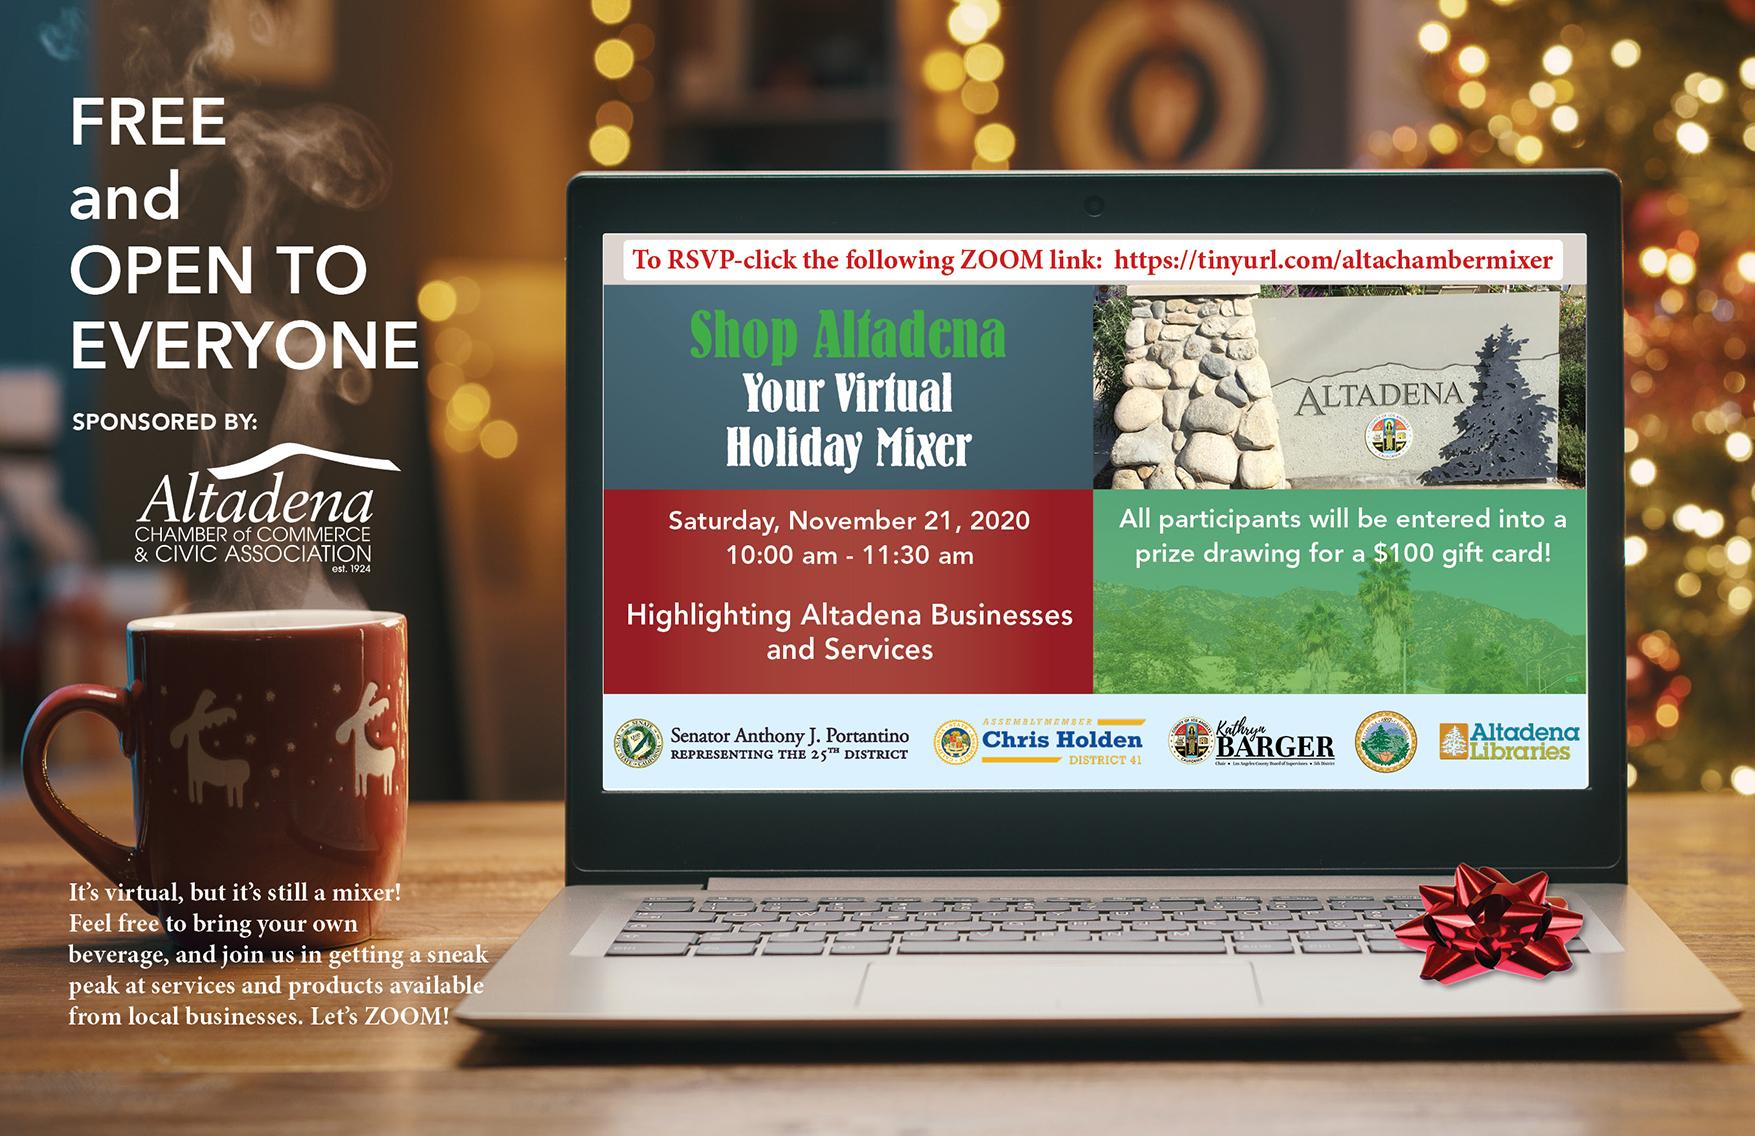 Shop Altadena's 2020 Virtual Holiday Mixer